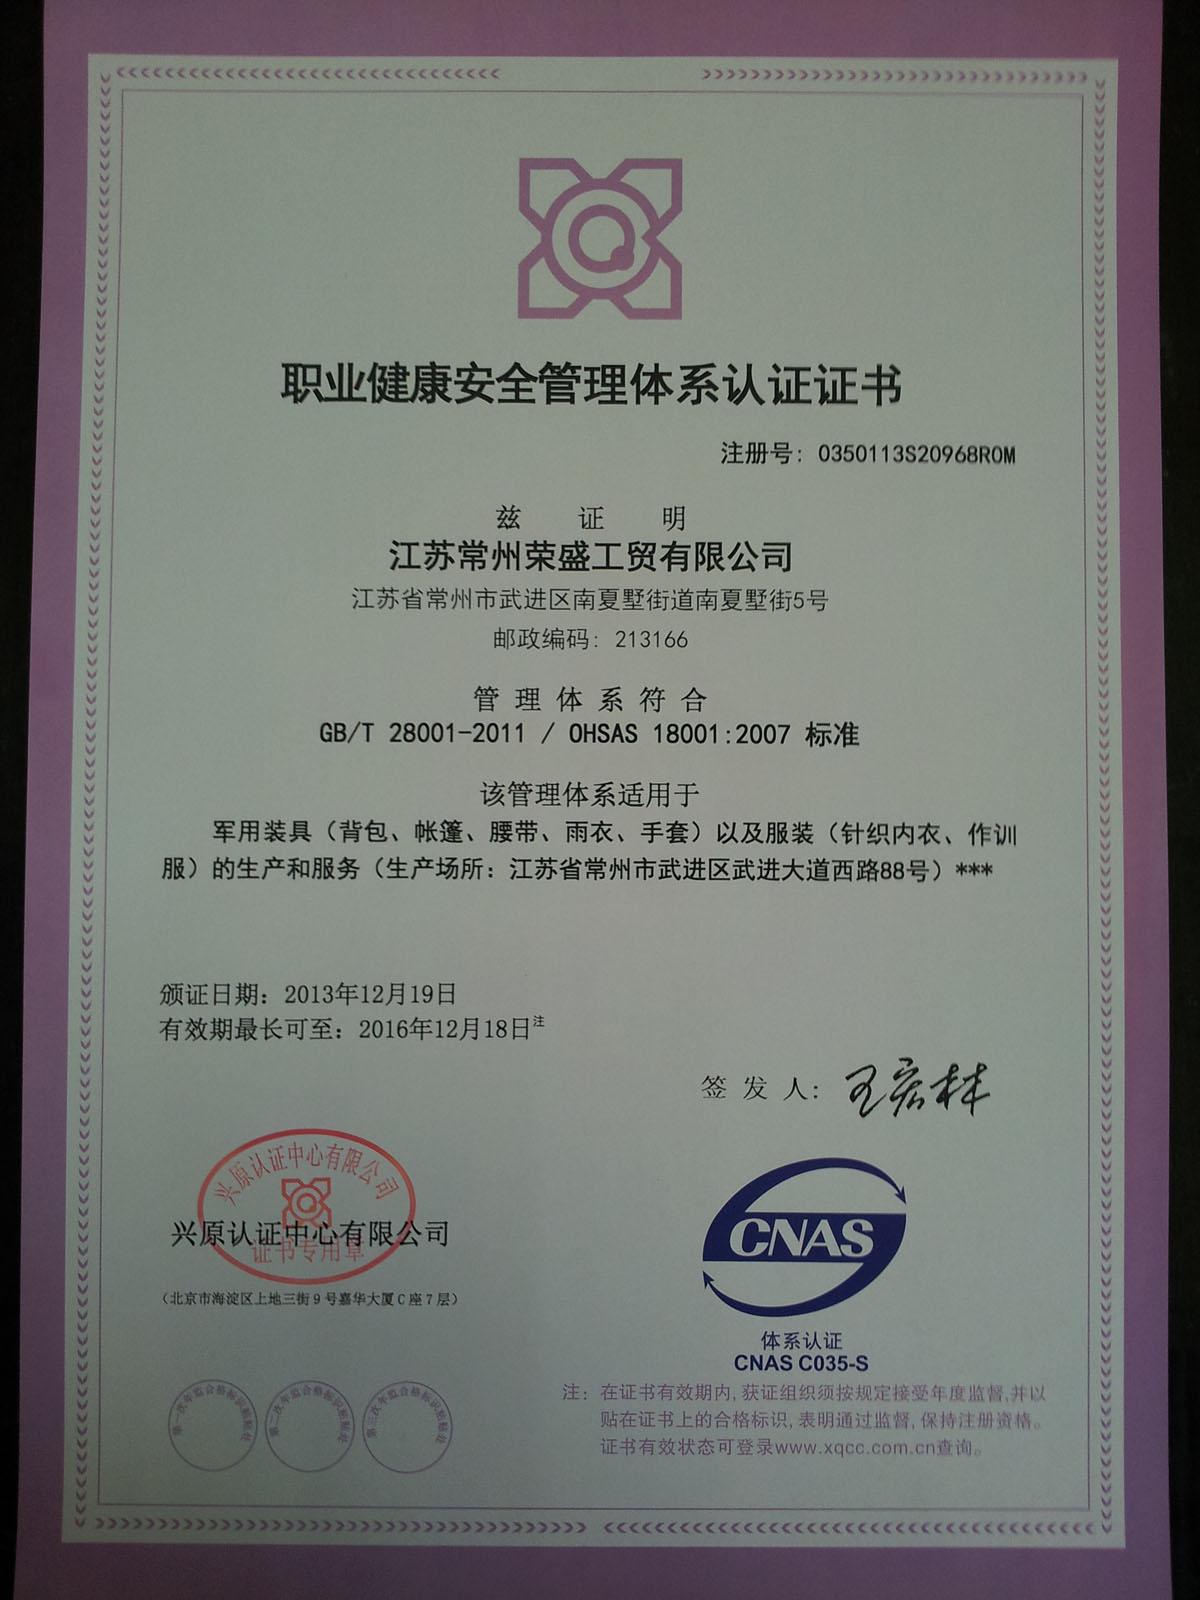 OHSAS 18001:2007 CERTIFICATE